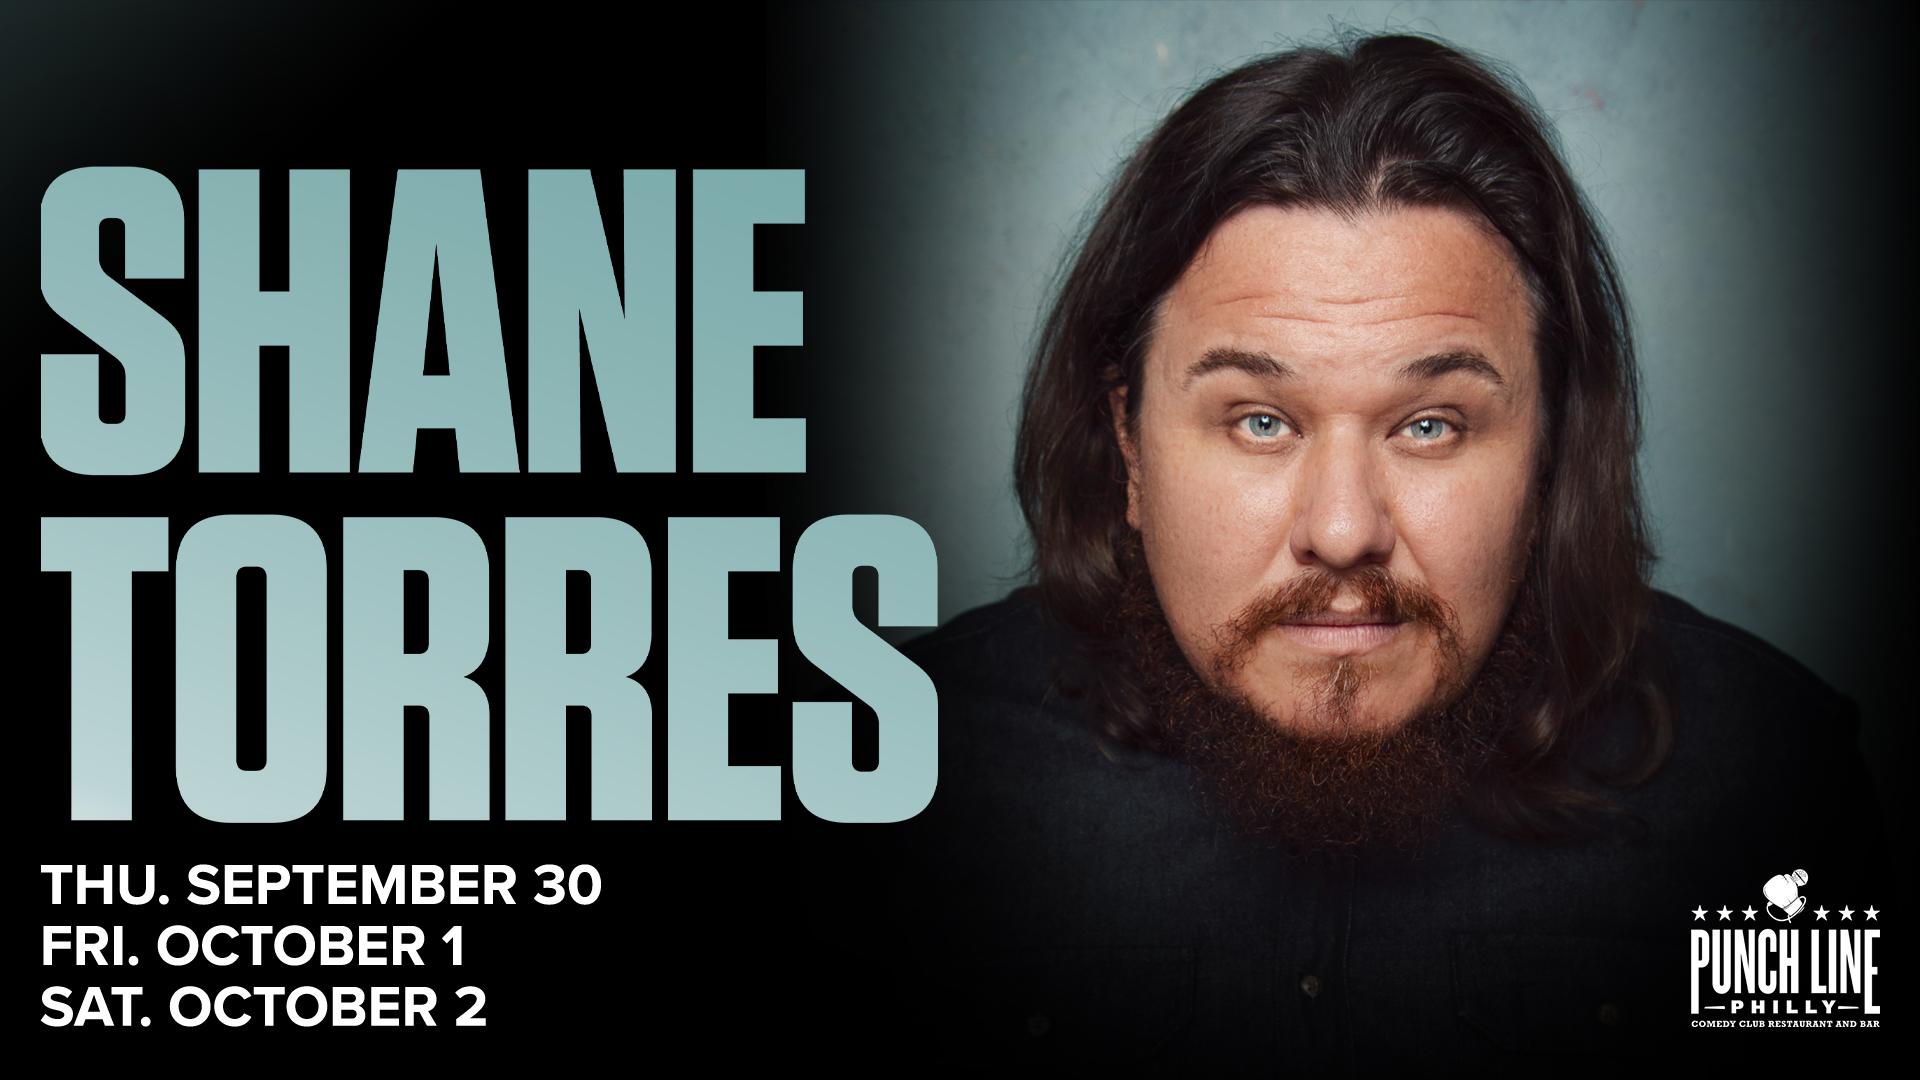 Shane Torres